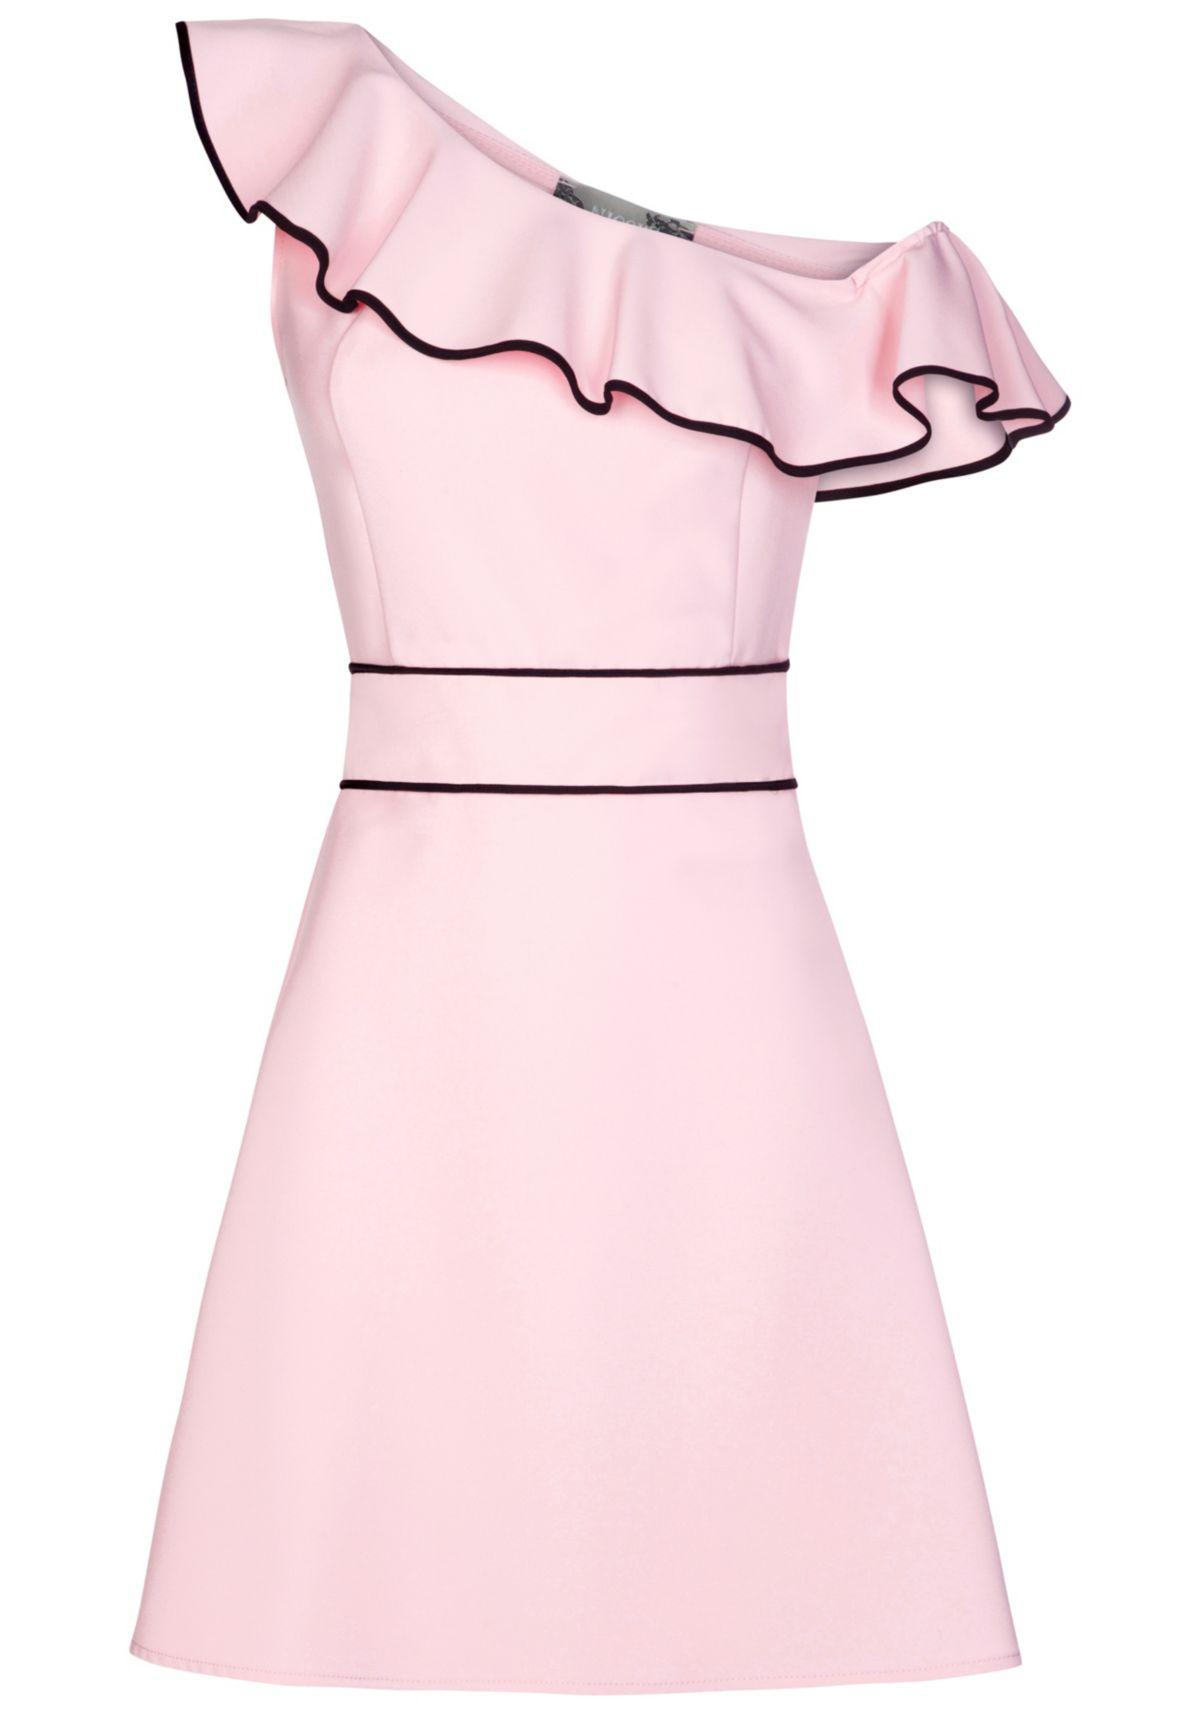 NICOWA Stilvolles Kleid ELINA mit femininen Det...